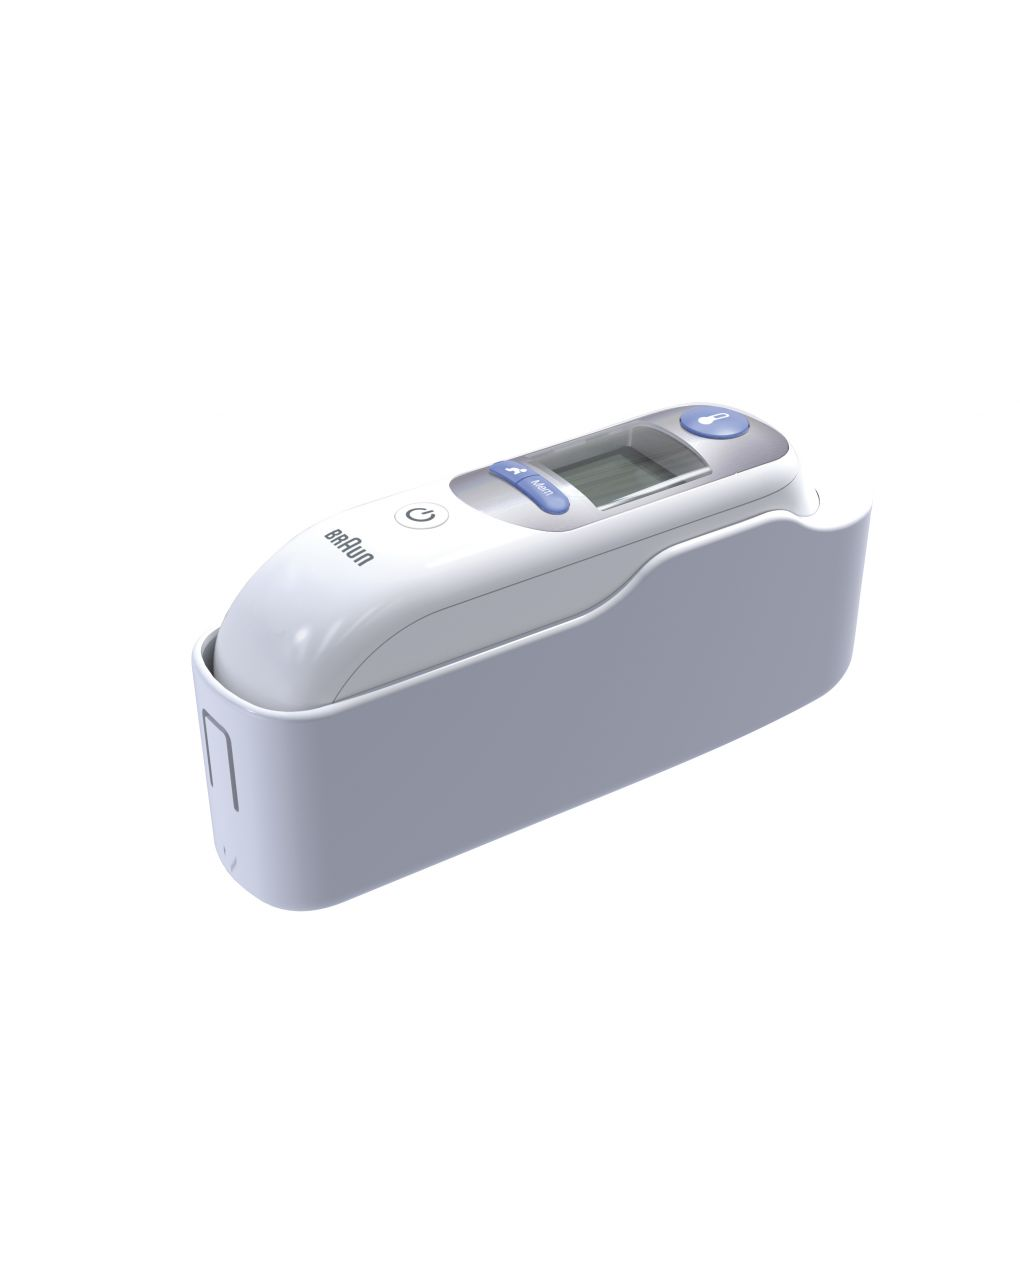 Termometro thermoscan 7 - Braun